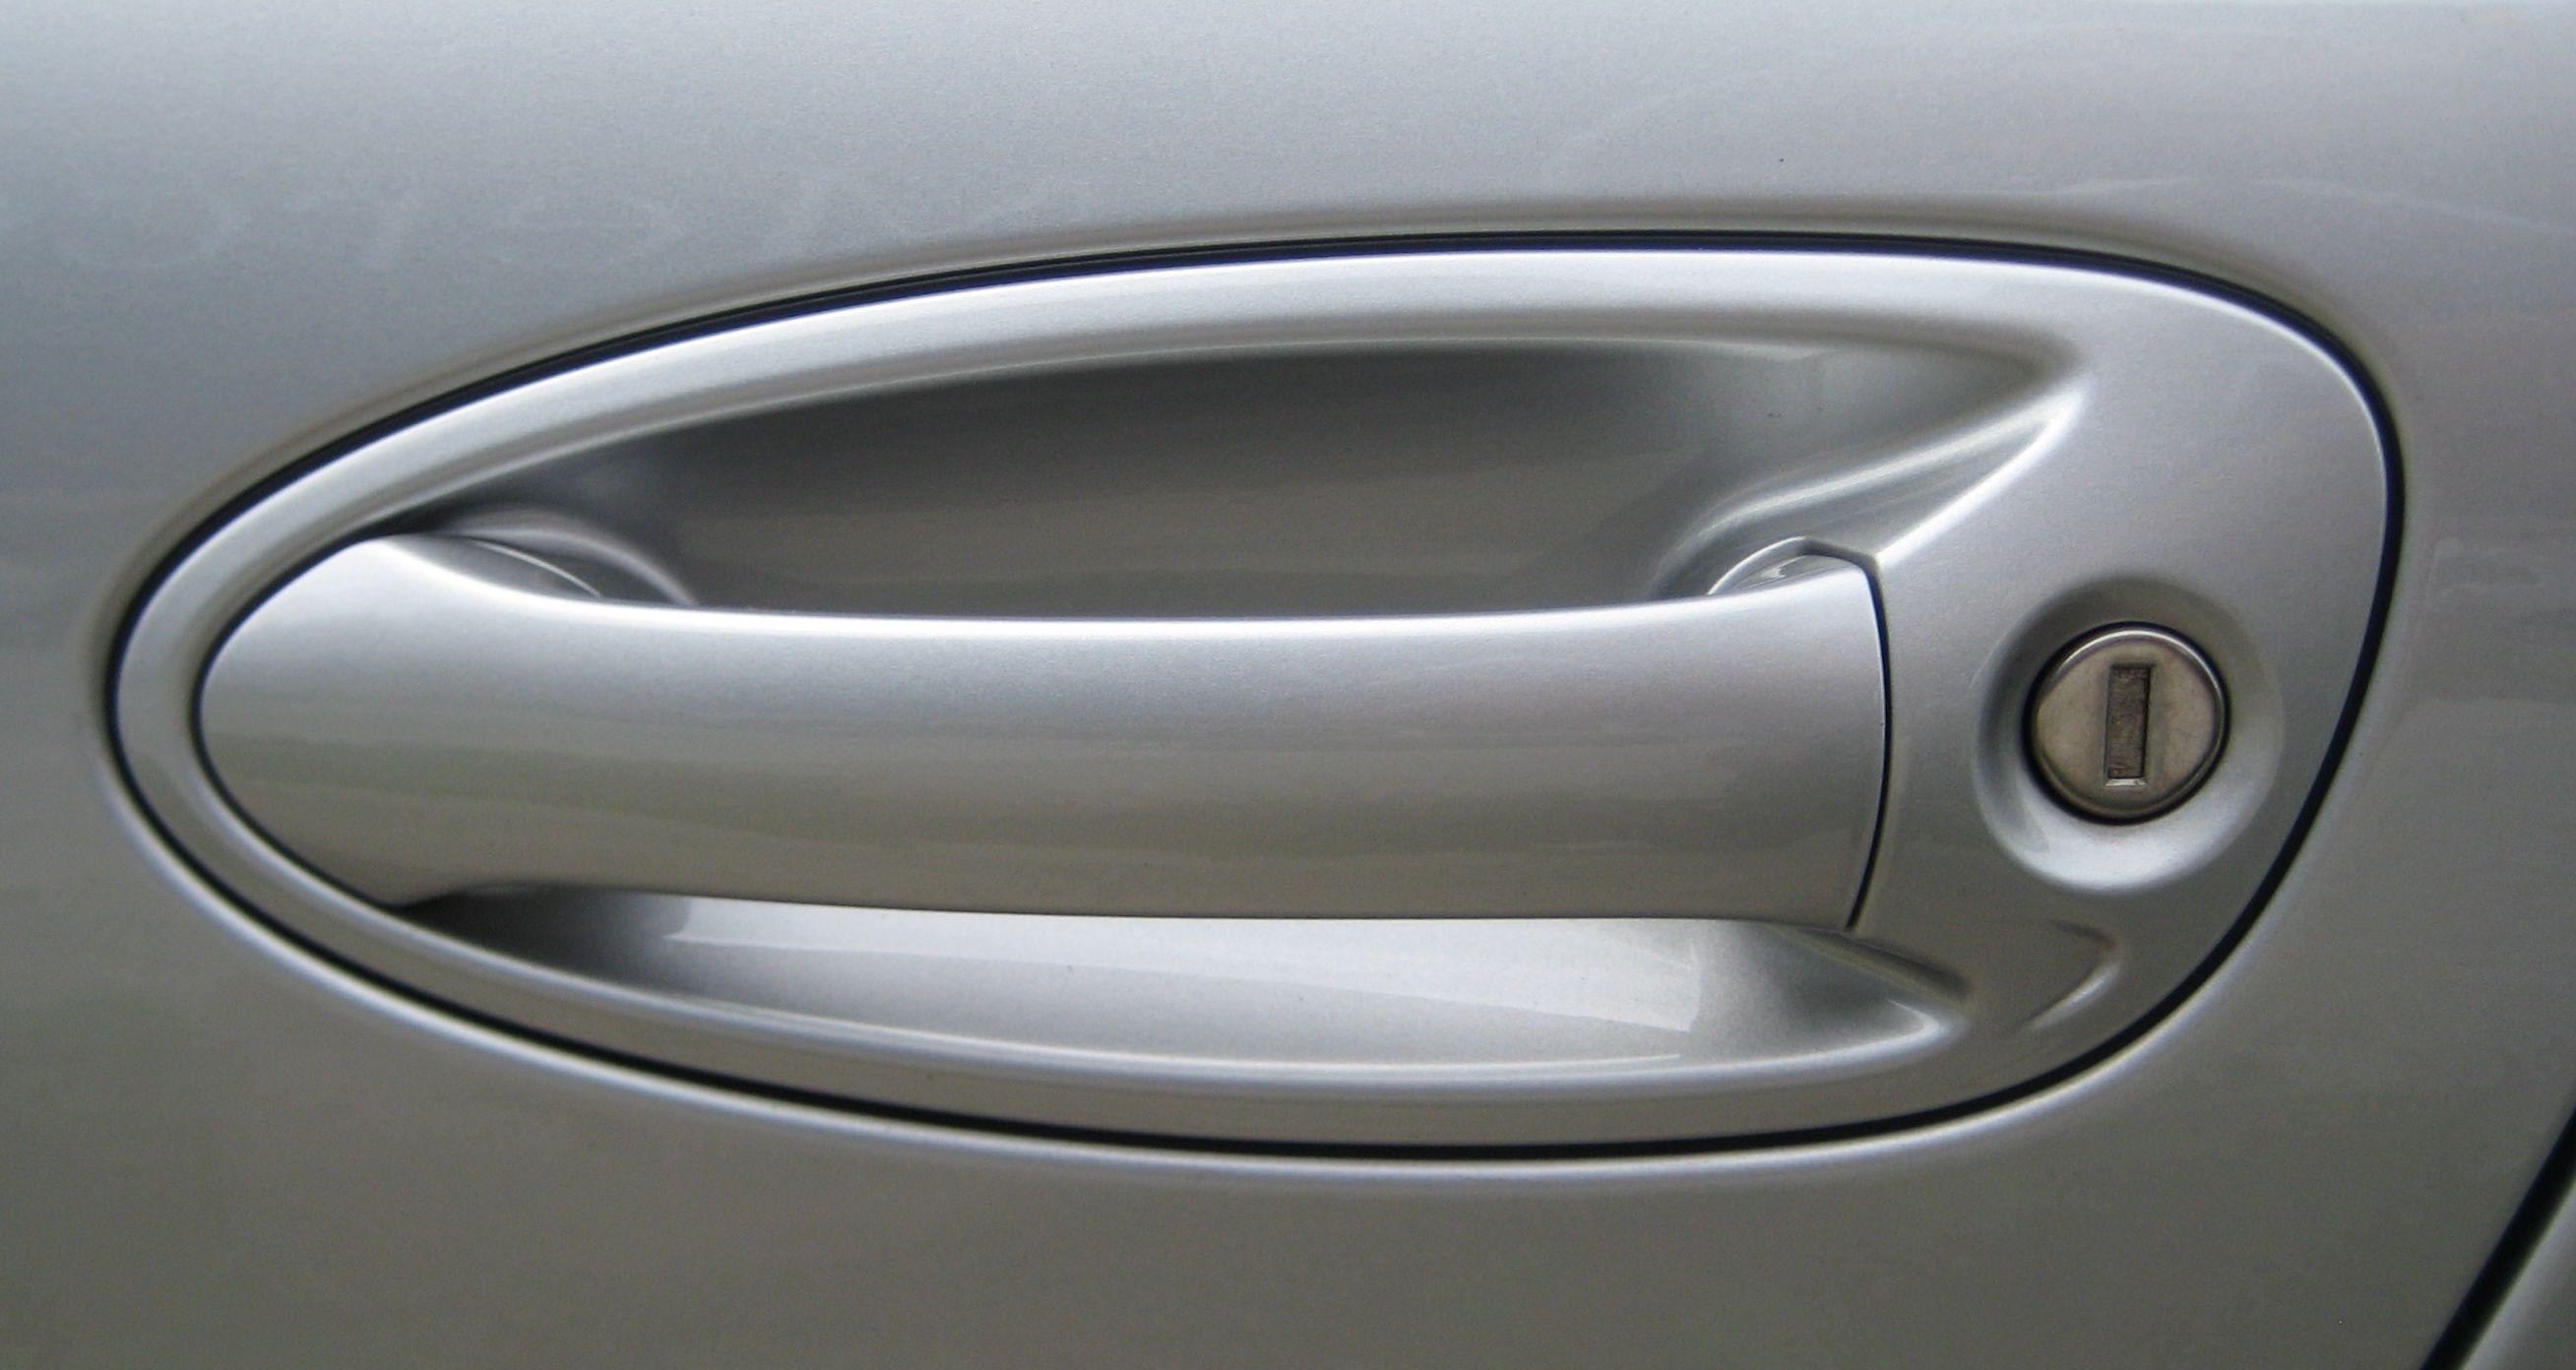 Car Door Handle with Keyhole in Los Angeles https://public.fotki.com ...